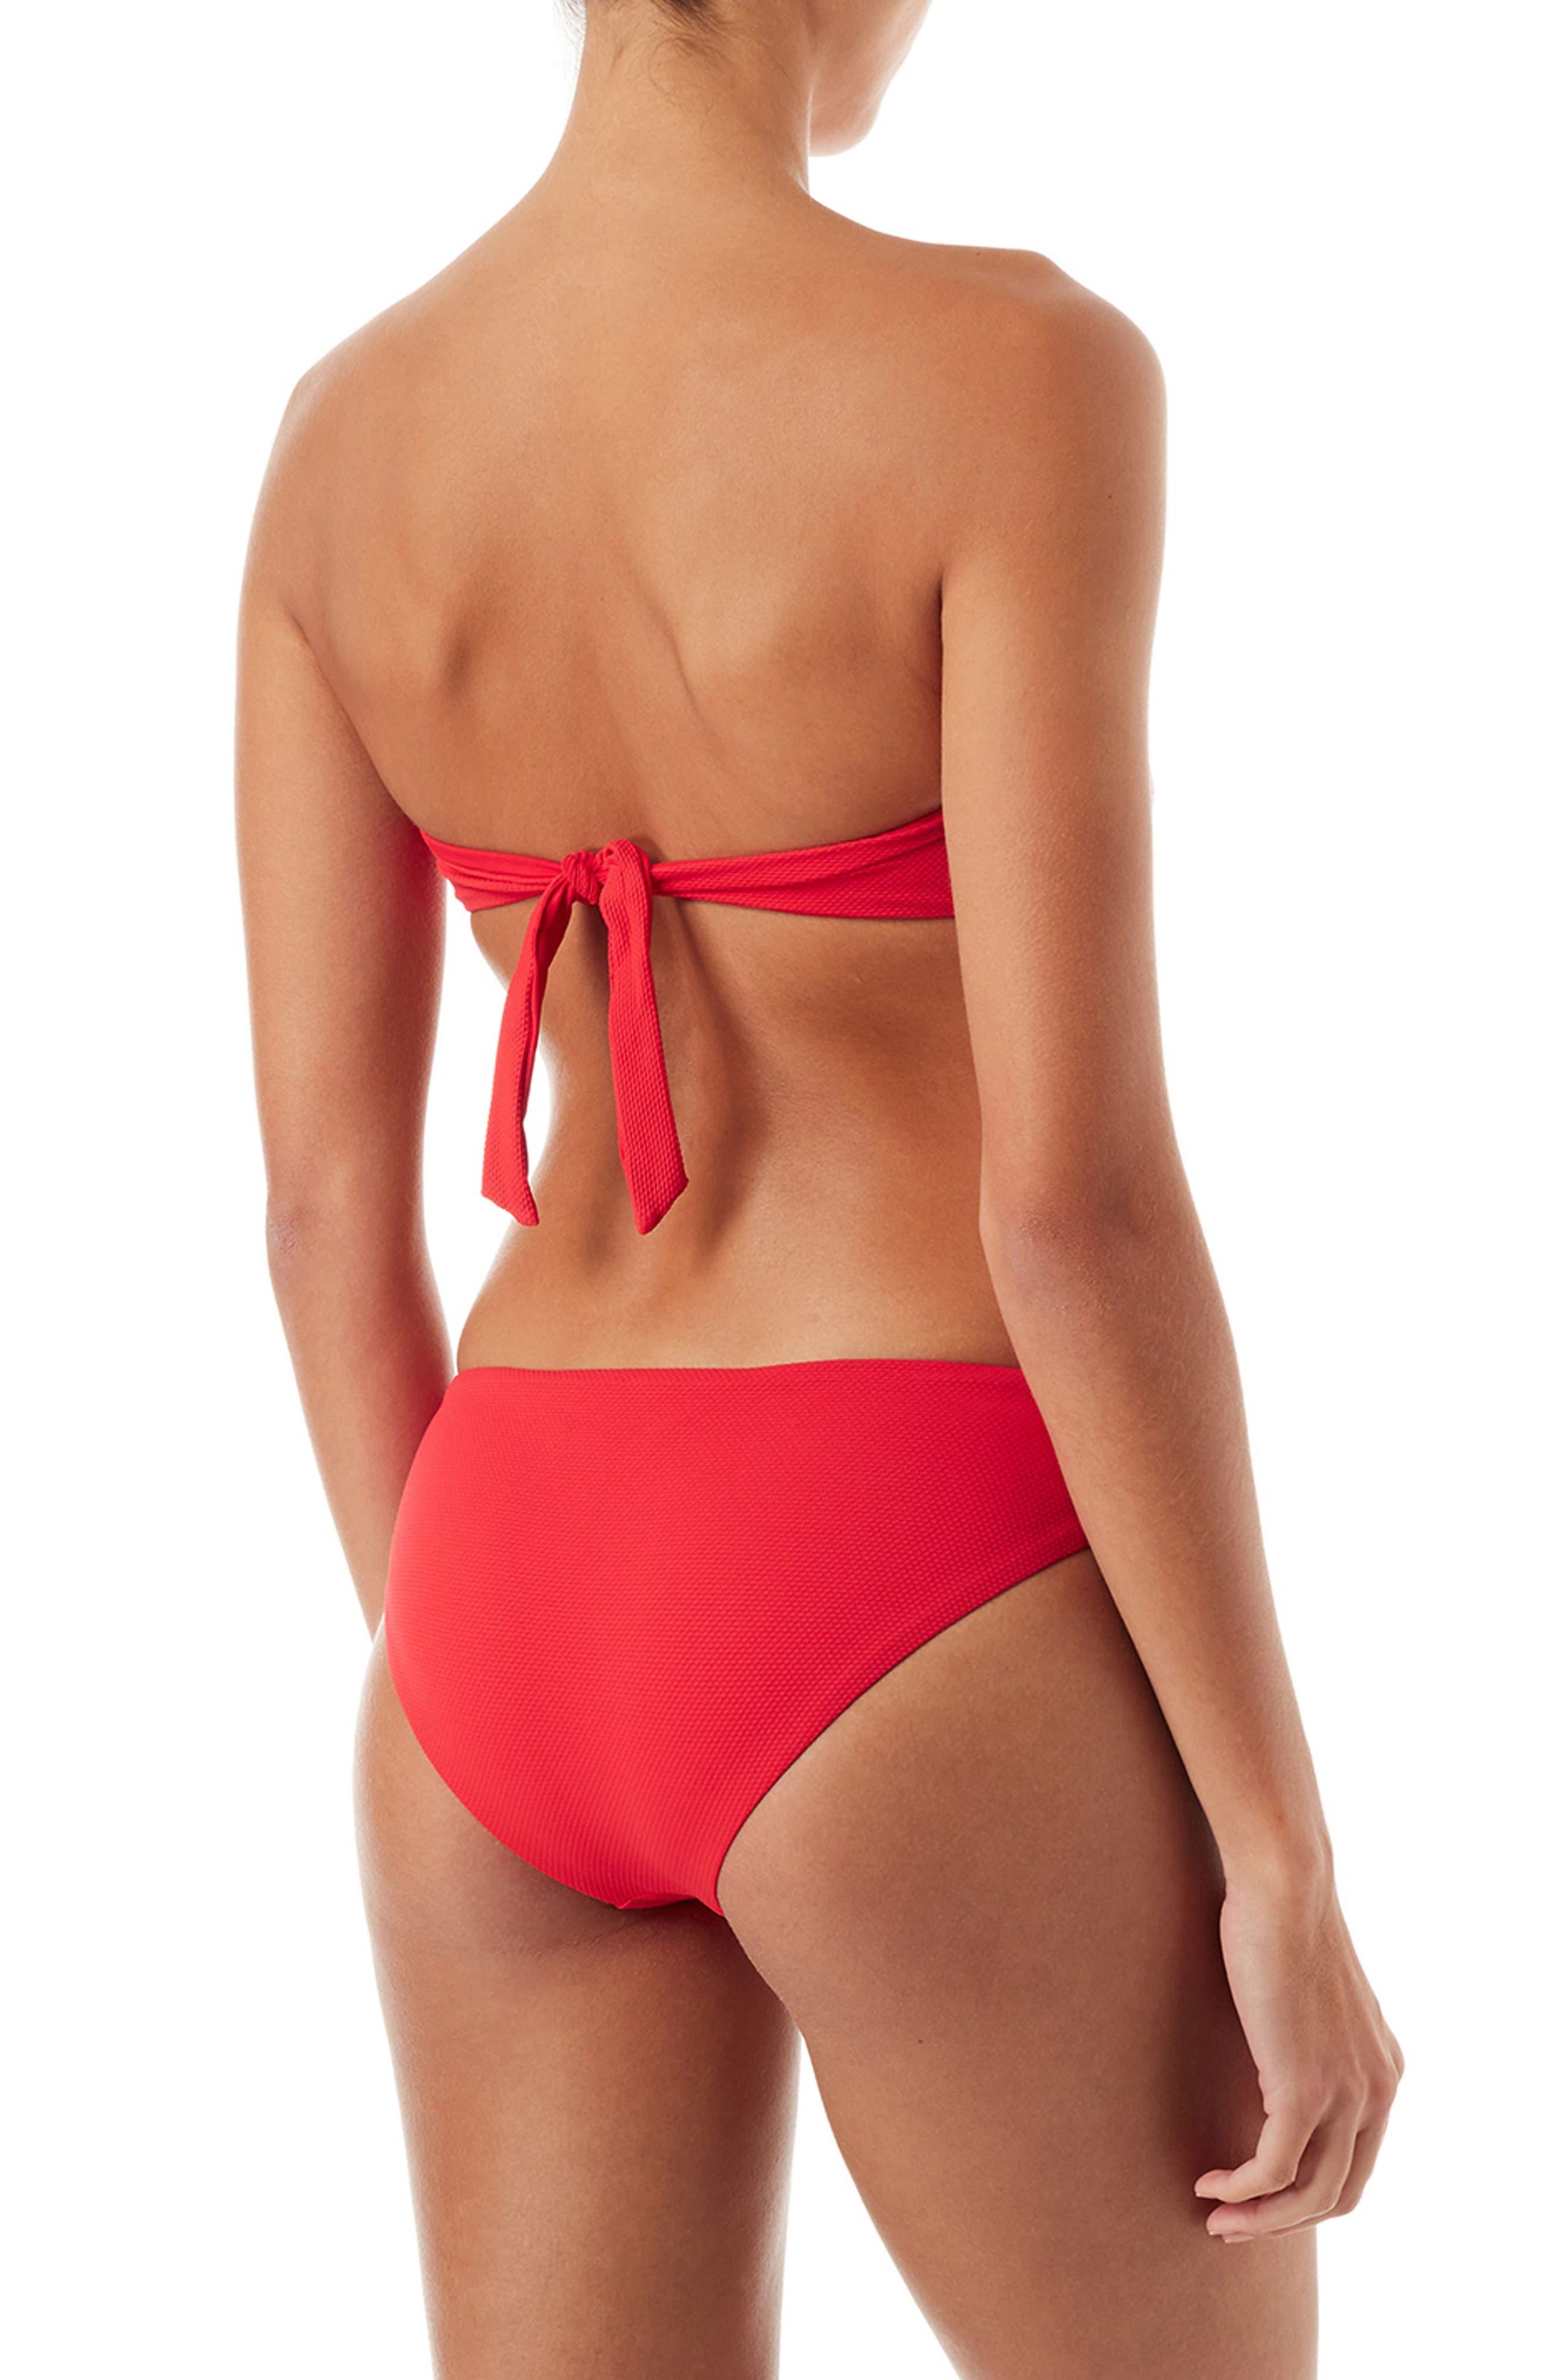 Angola Bikini Bottoms,                             Alternate thumbnail 4, color,                             Pique Red